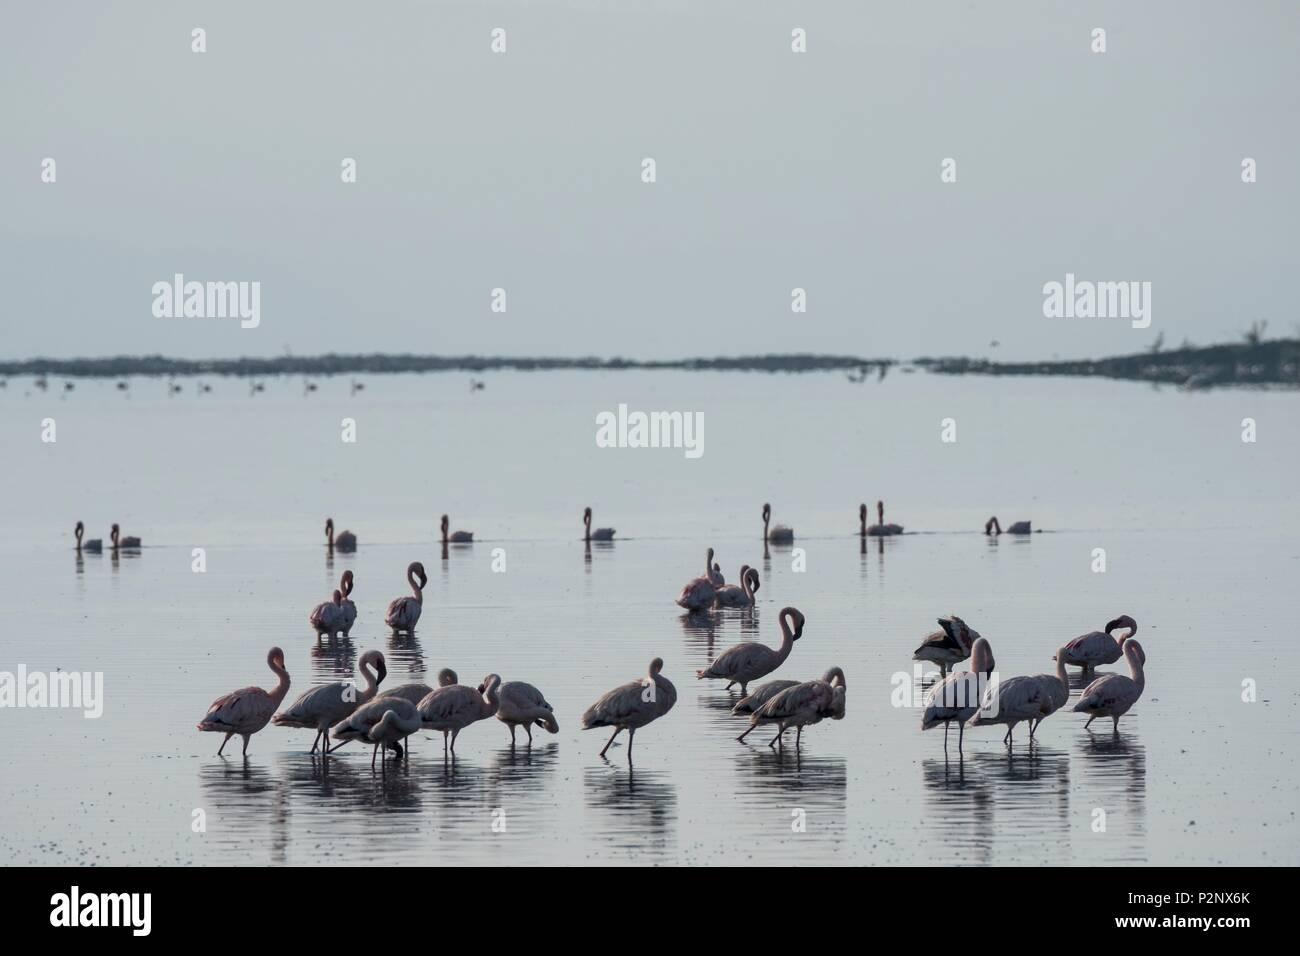 Kenia, Soysambu Conservancy, lesser Flamingo (Phoeniconaias minor), auf der Lake Elementeita Stockbild